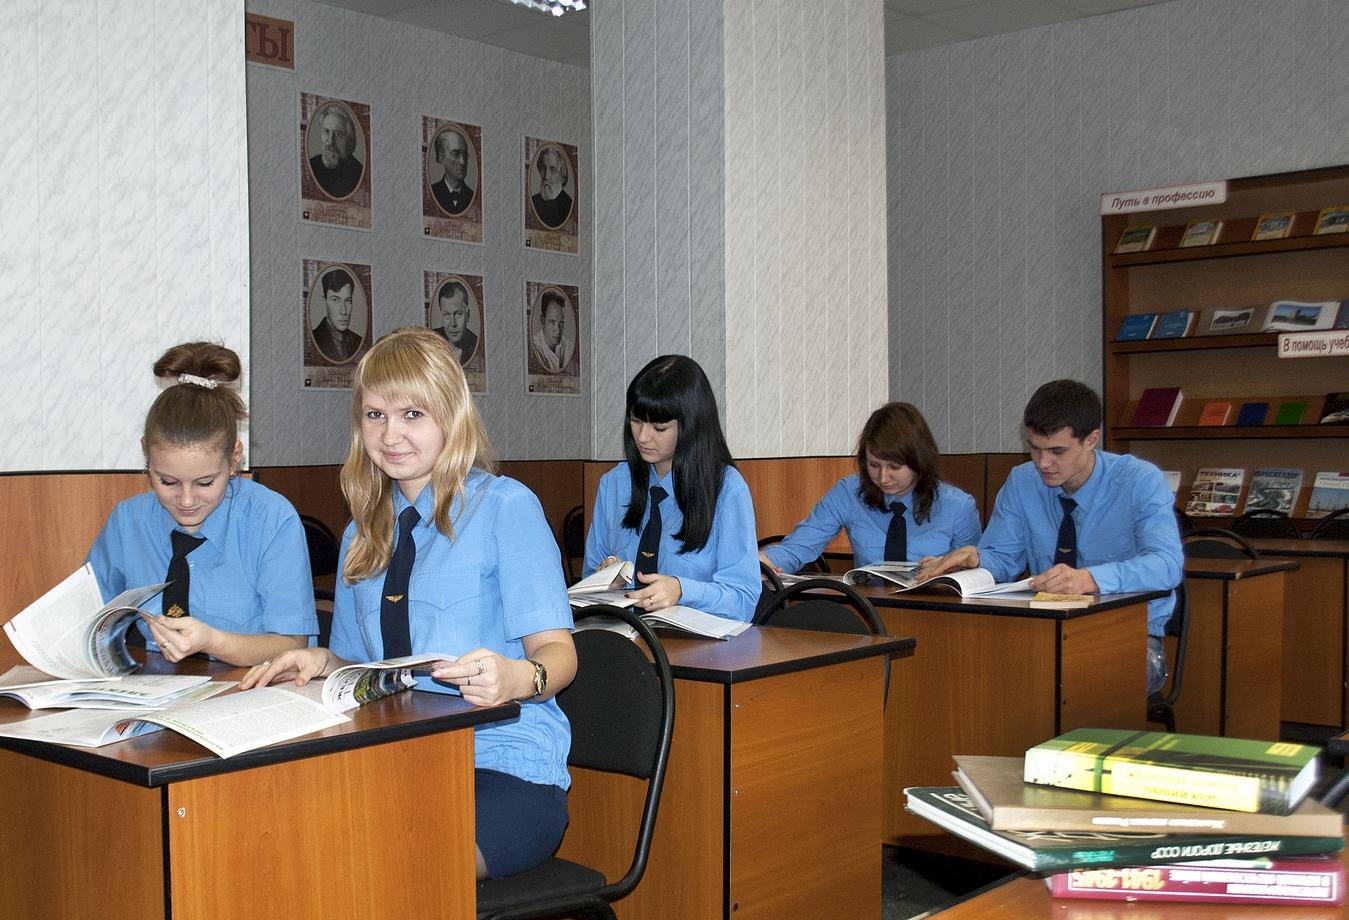 жд форма для студентов фото